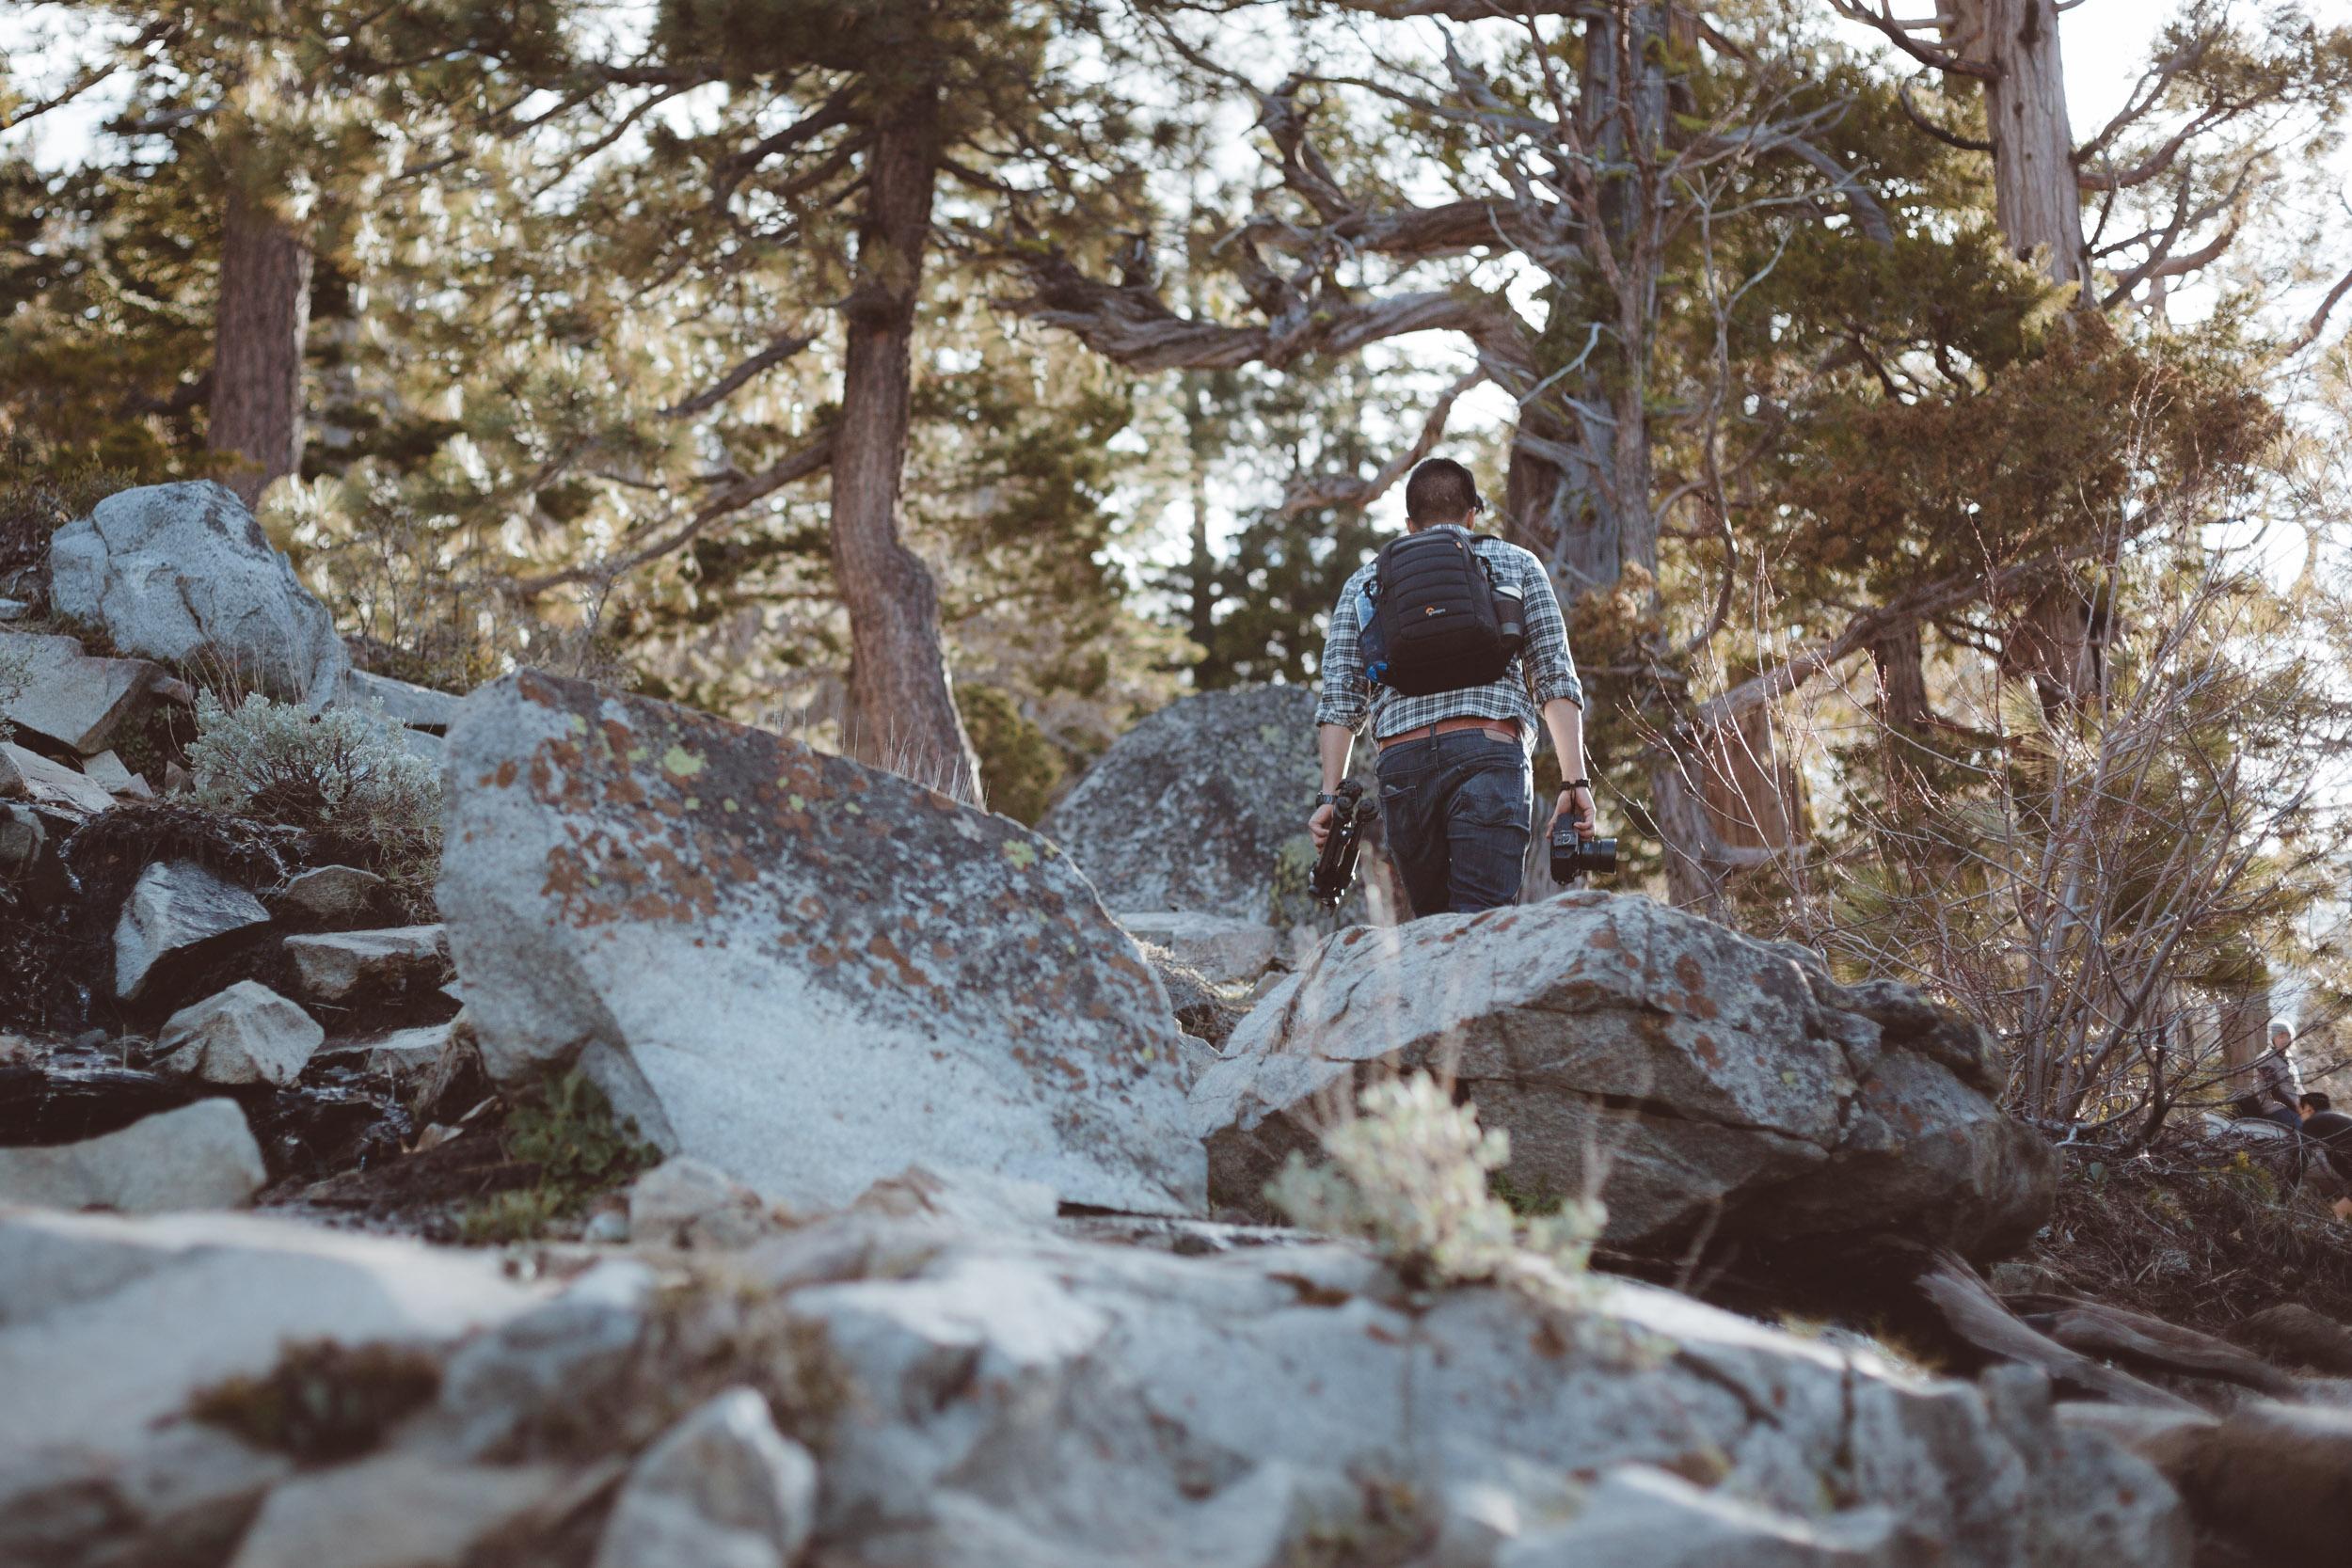 west-shore-adventure-eagle-falls-exploration-hike-and-shoot-1.jpg